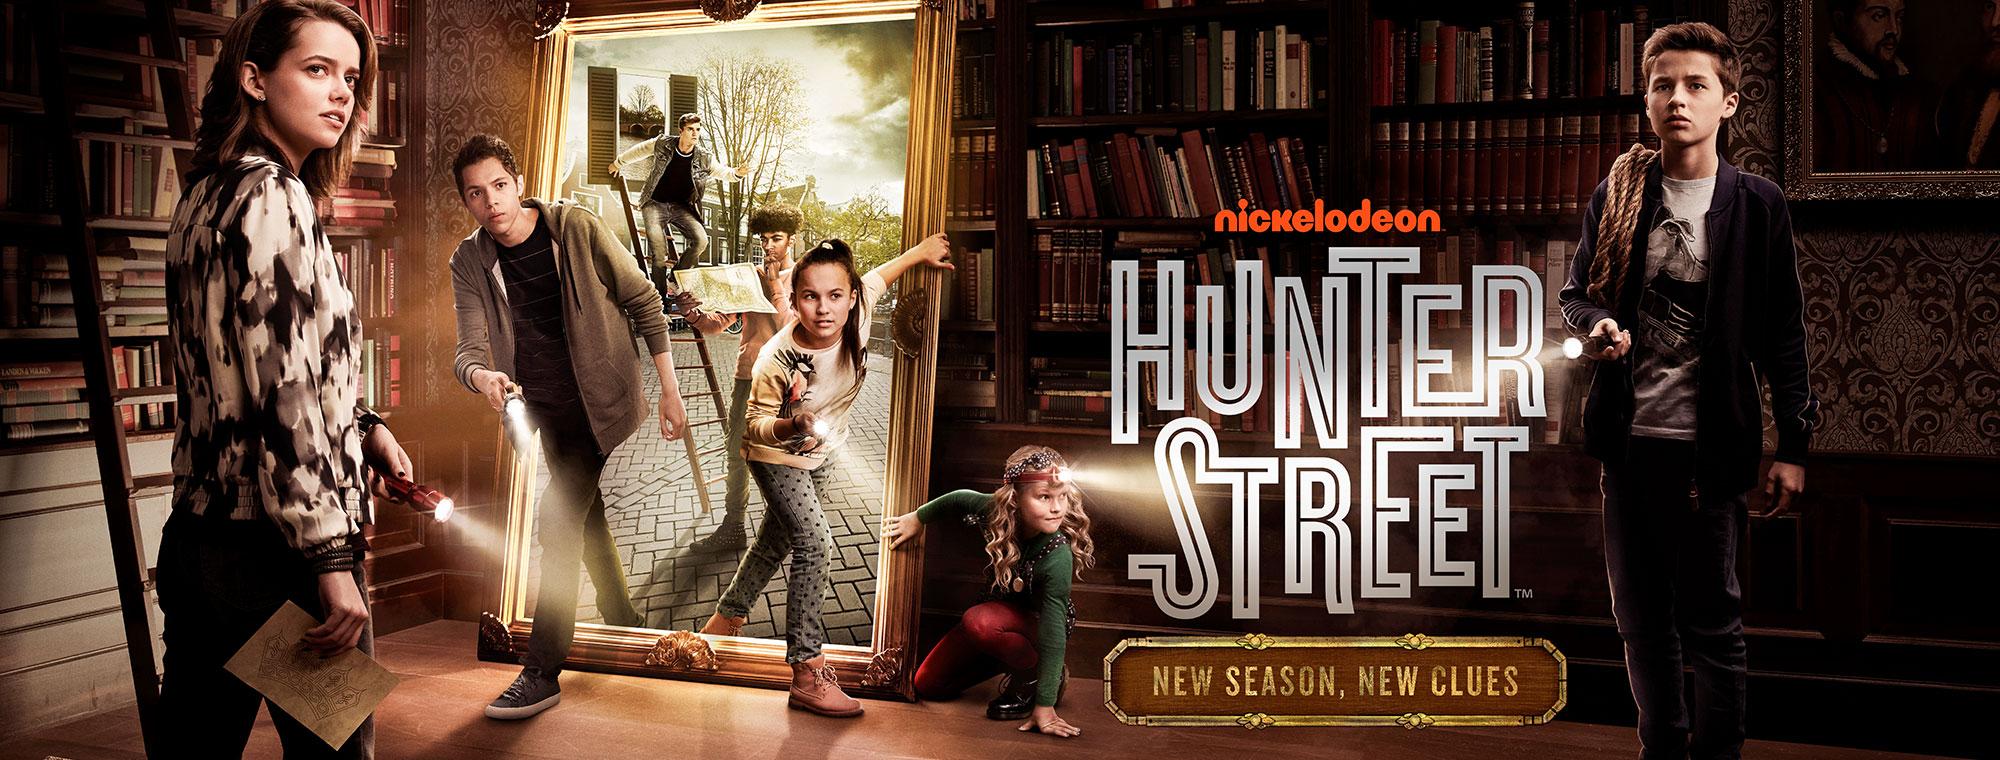 Hunterstreet SEASON 2